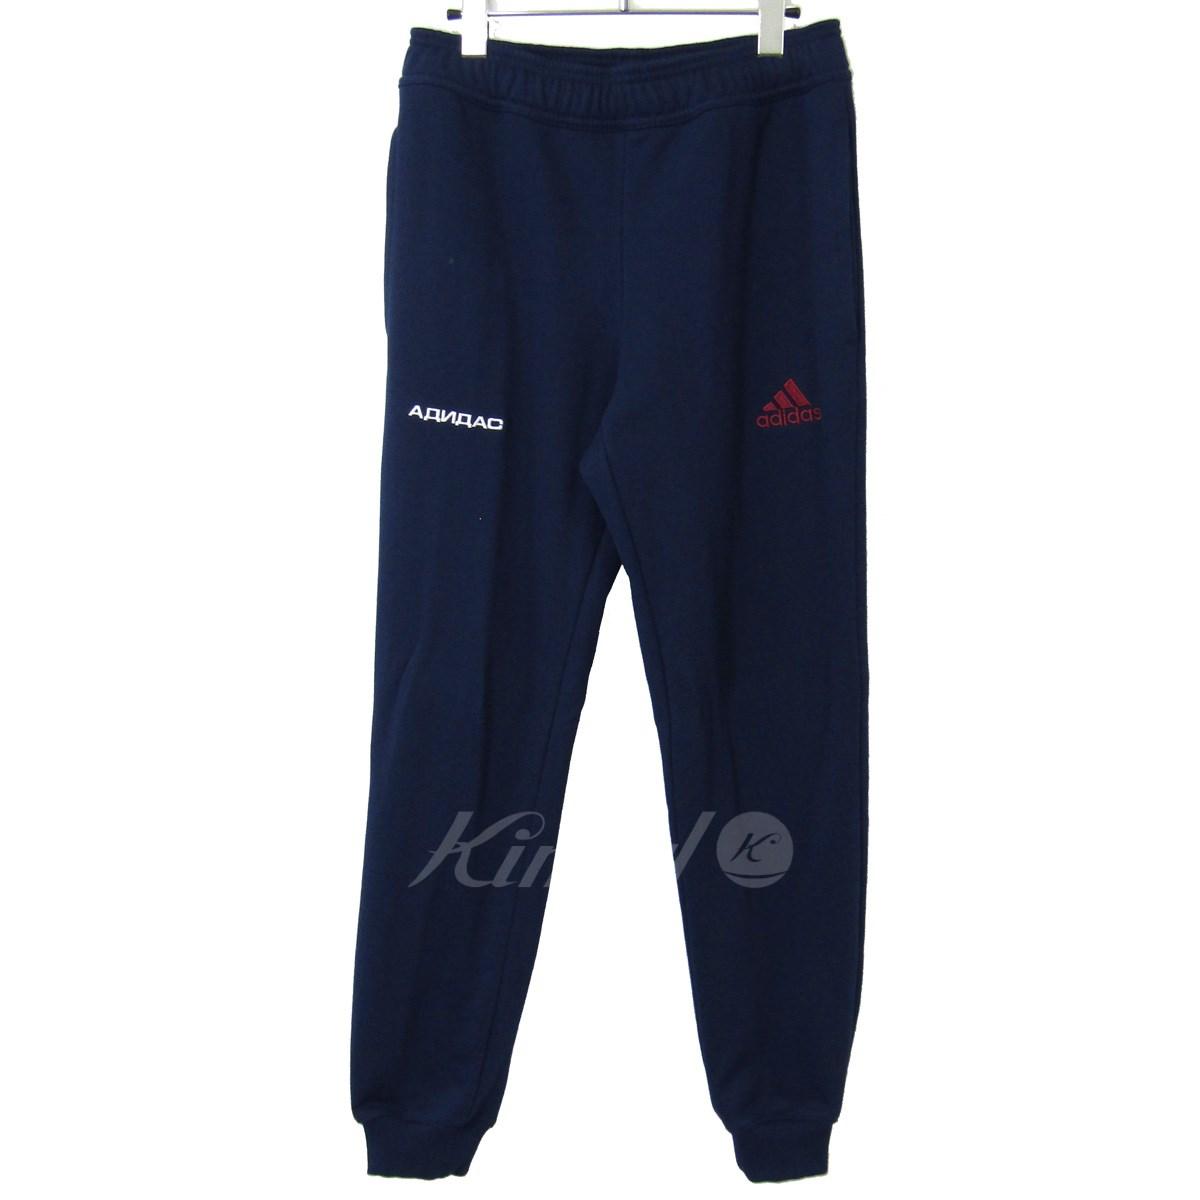 save off 9be87 2560d Gosha Rubchinskiy 2018SS Sweatpants trackpants navy size: medium